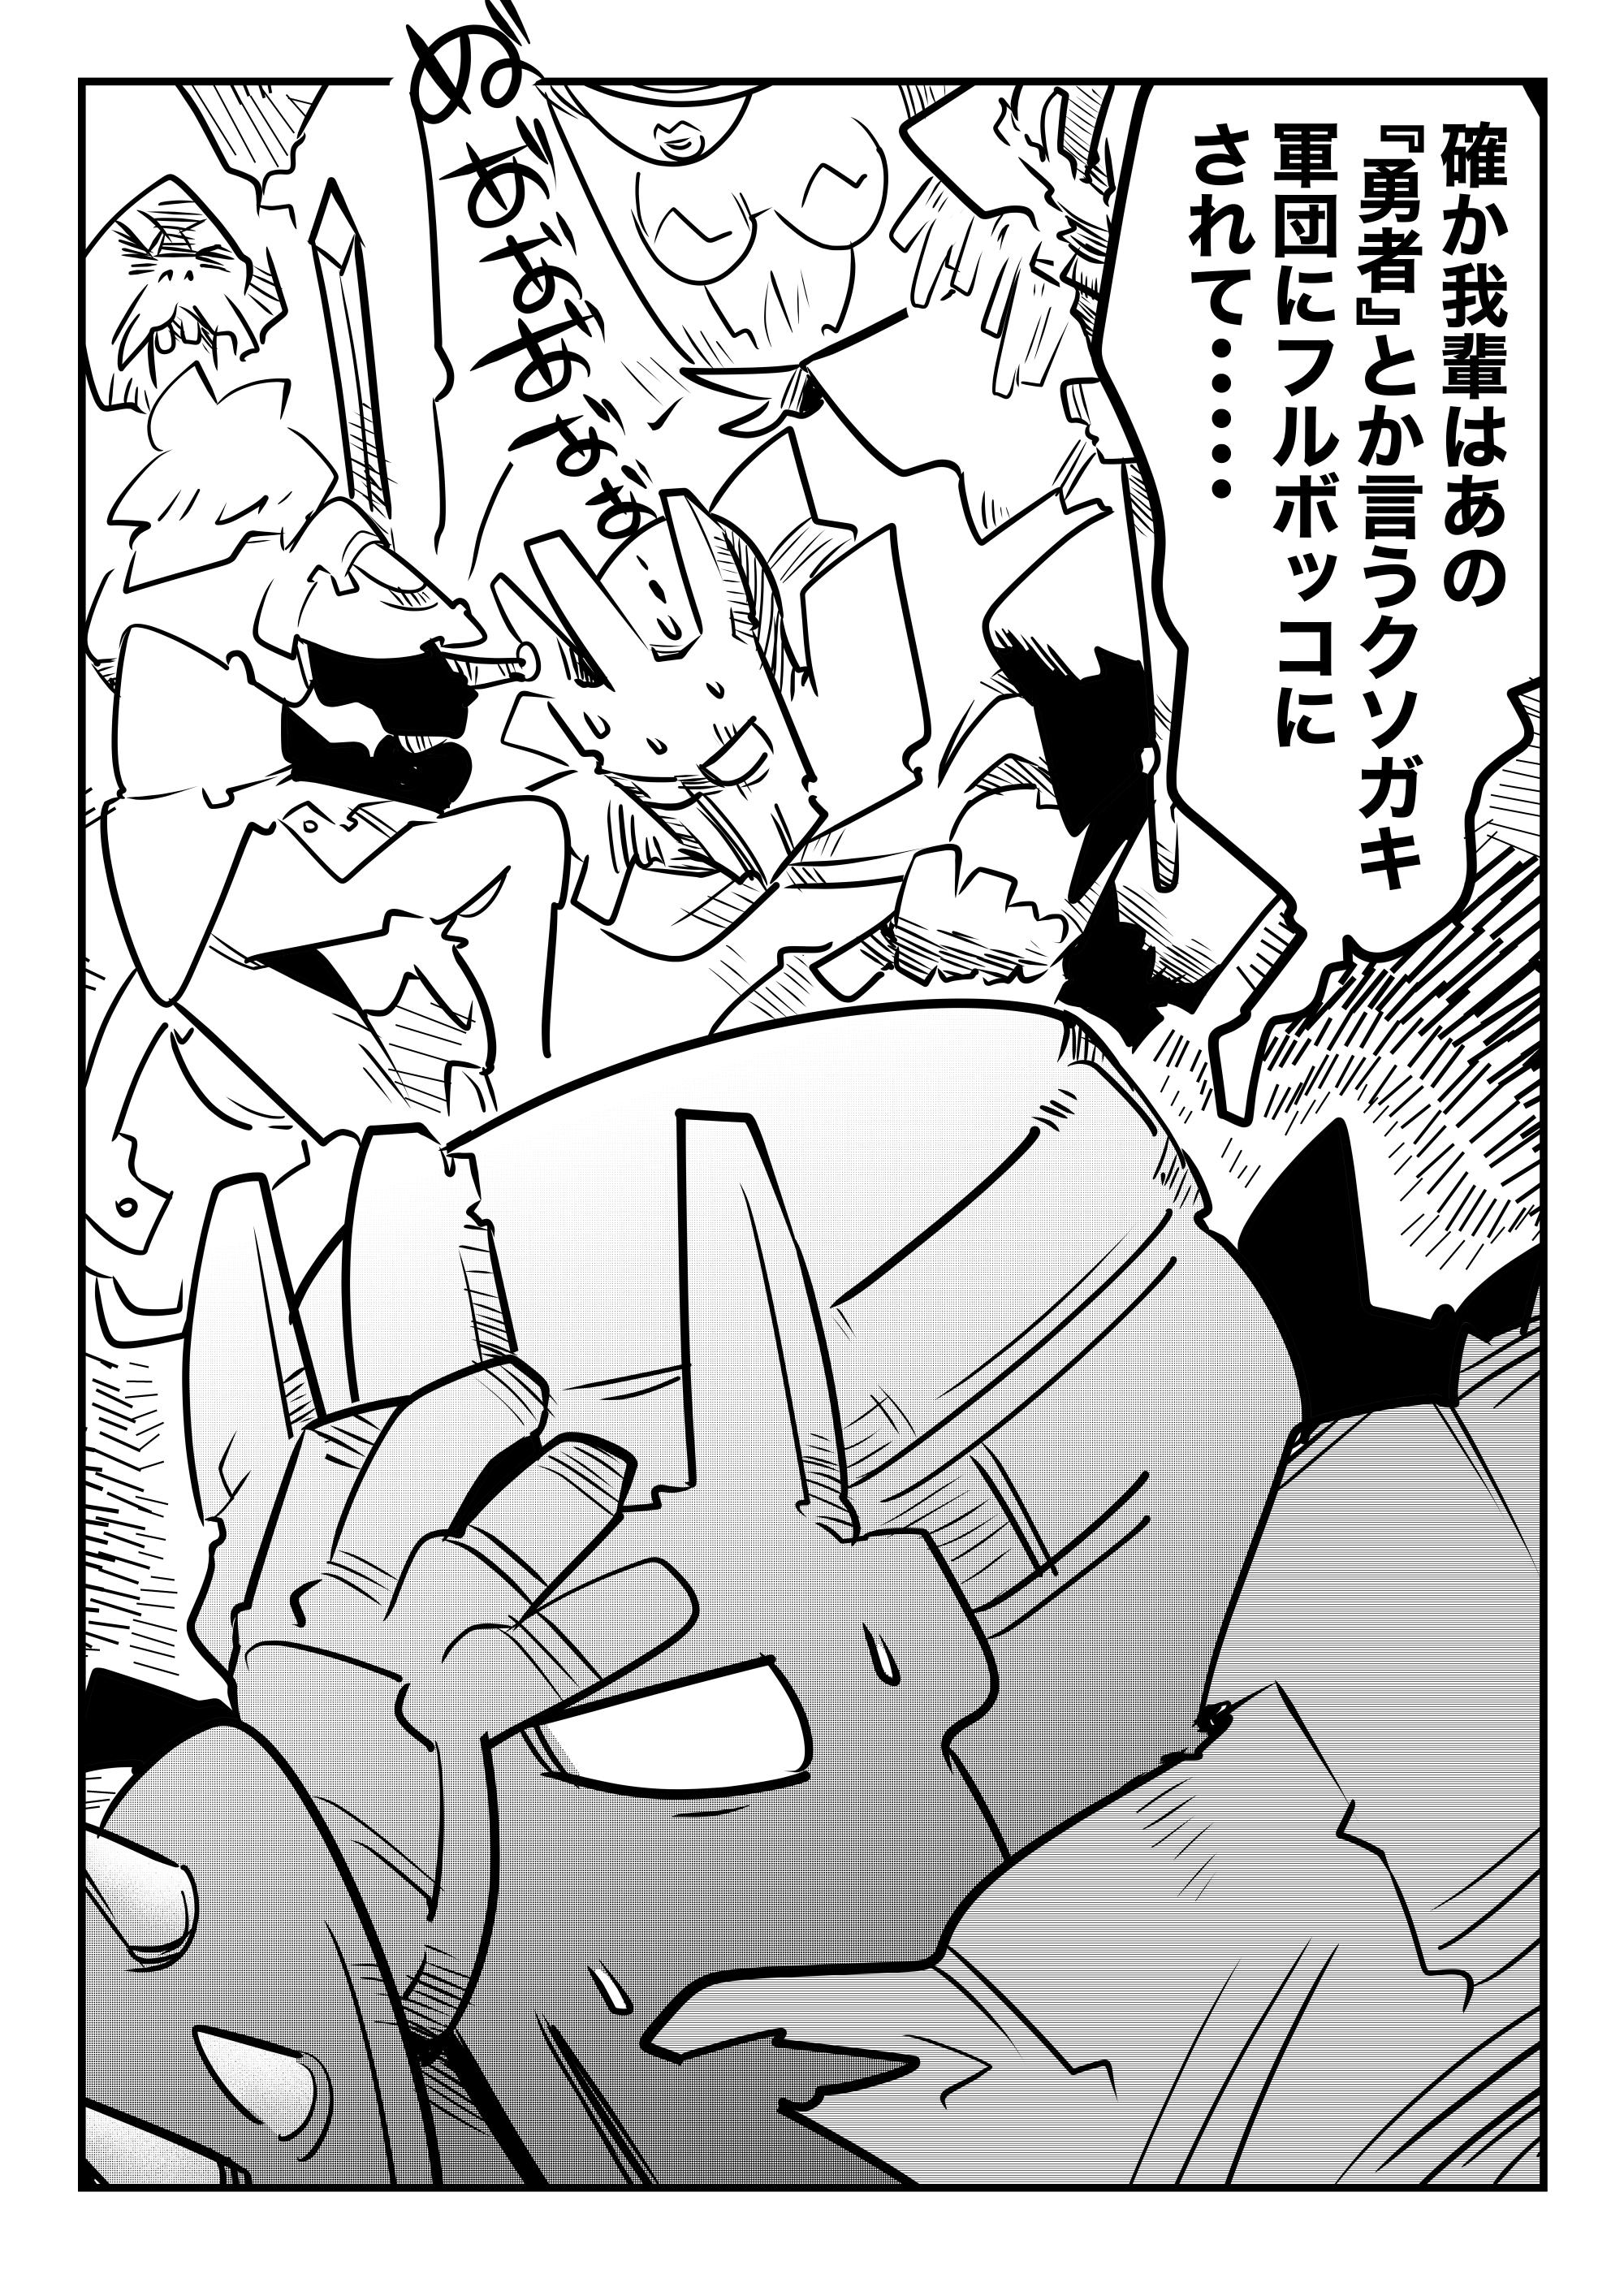 f:id:terashimaru117:20210914182925p:plain